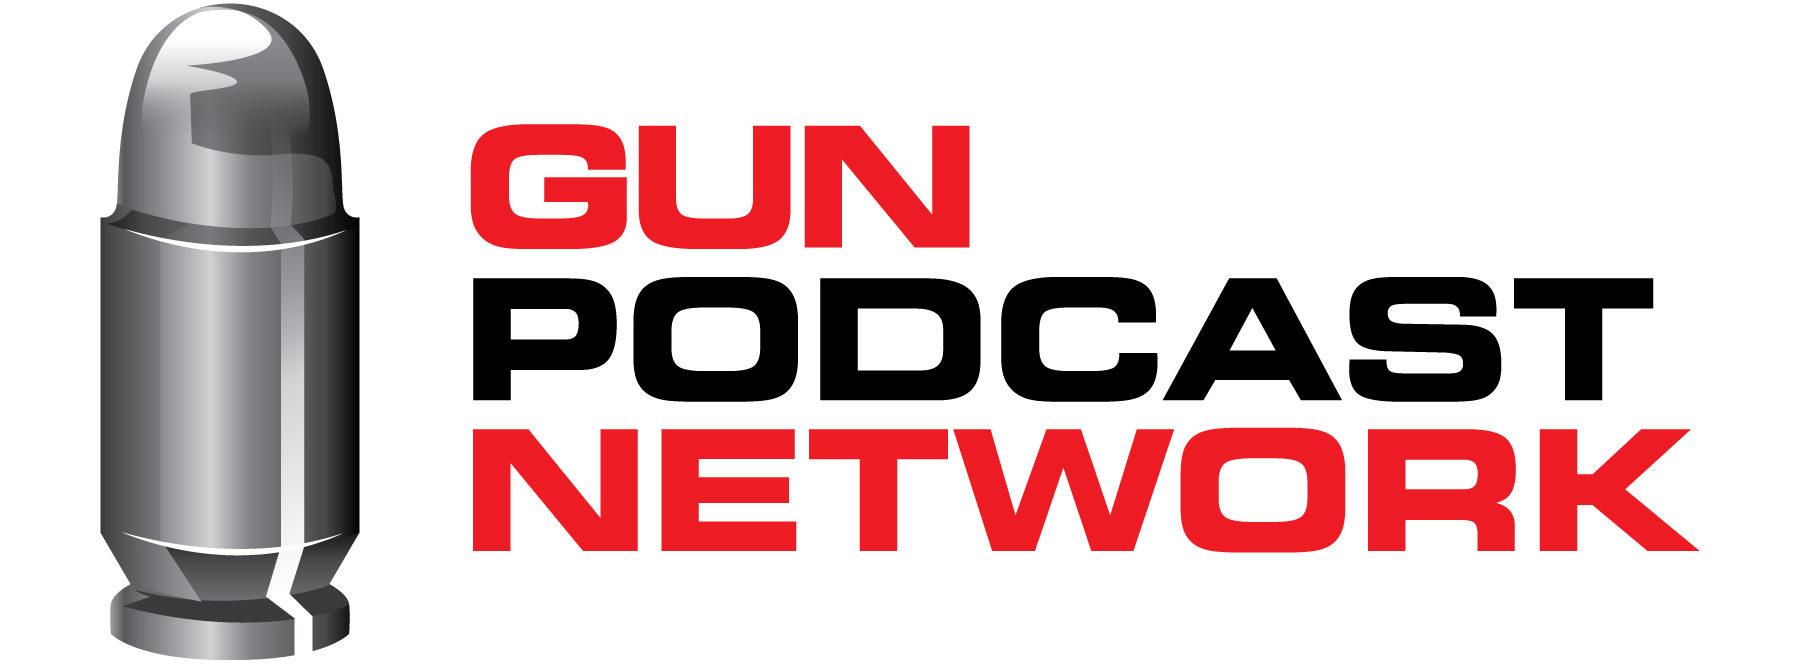 Gun podcast network image